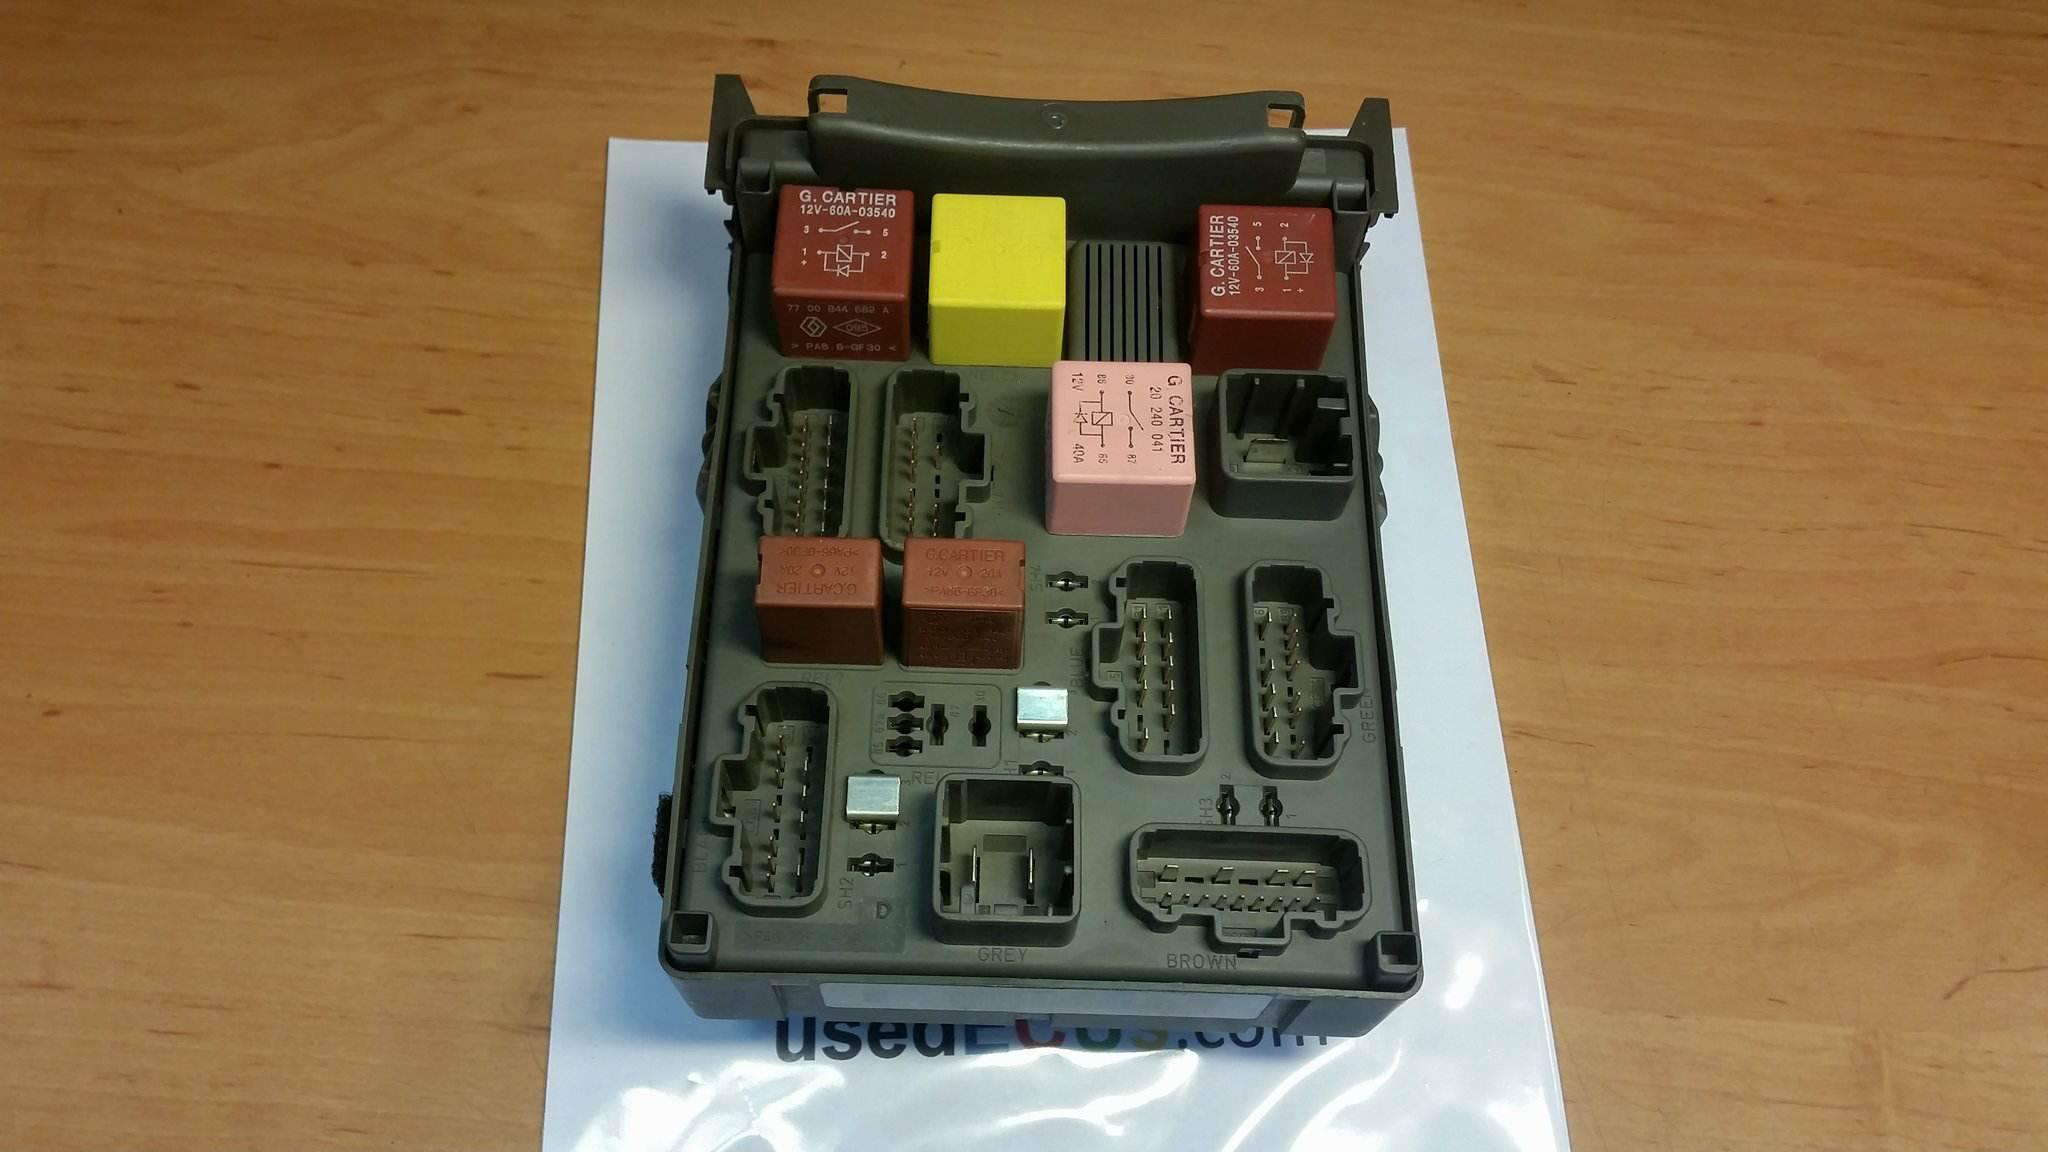 Mondeo Mk4 Fuse Picturesque Relay Box On A Renault Espace Laguna Interior E Article 2048x1152